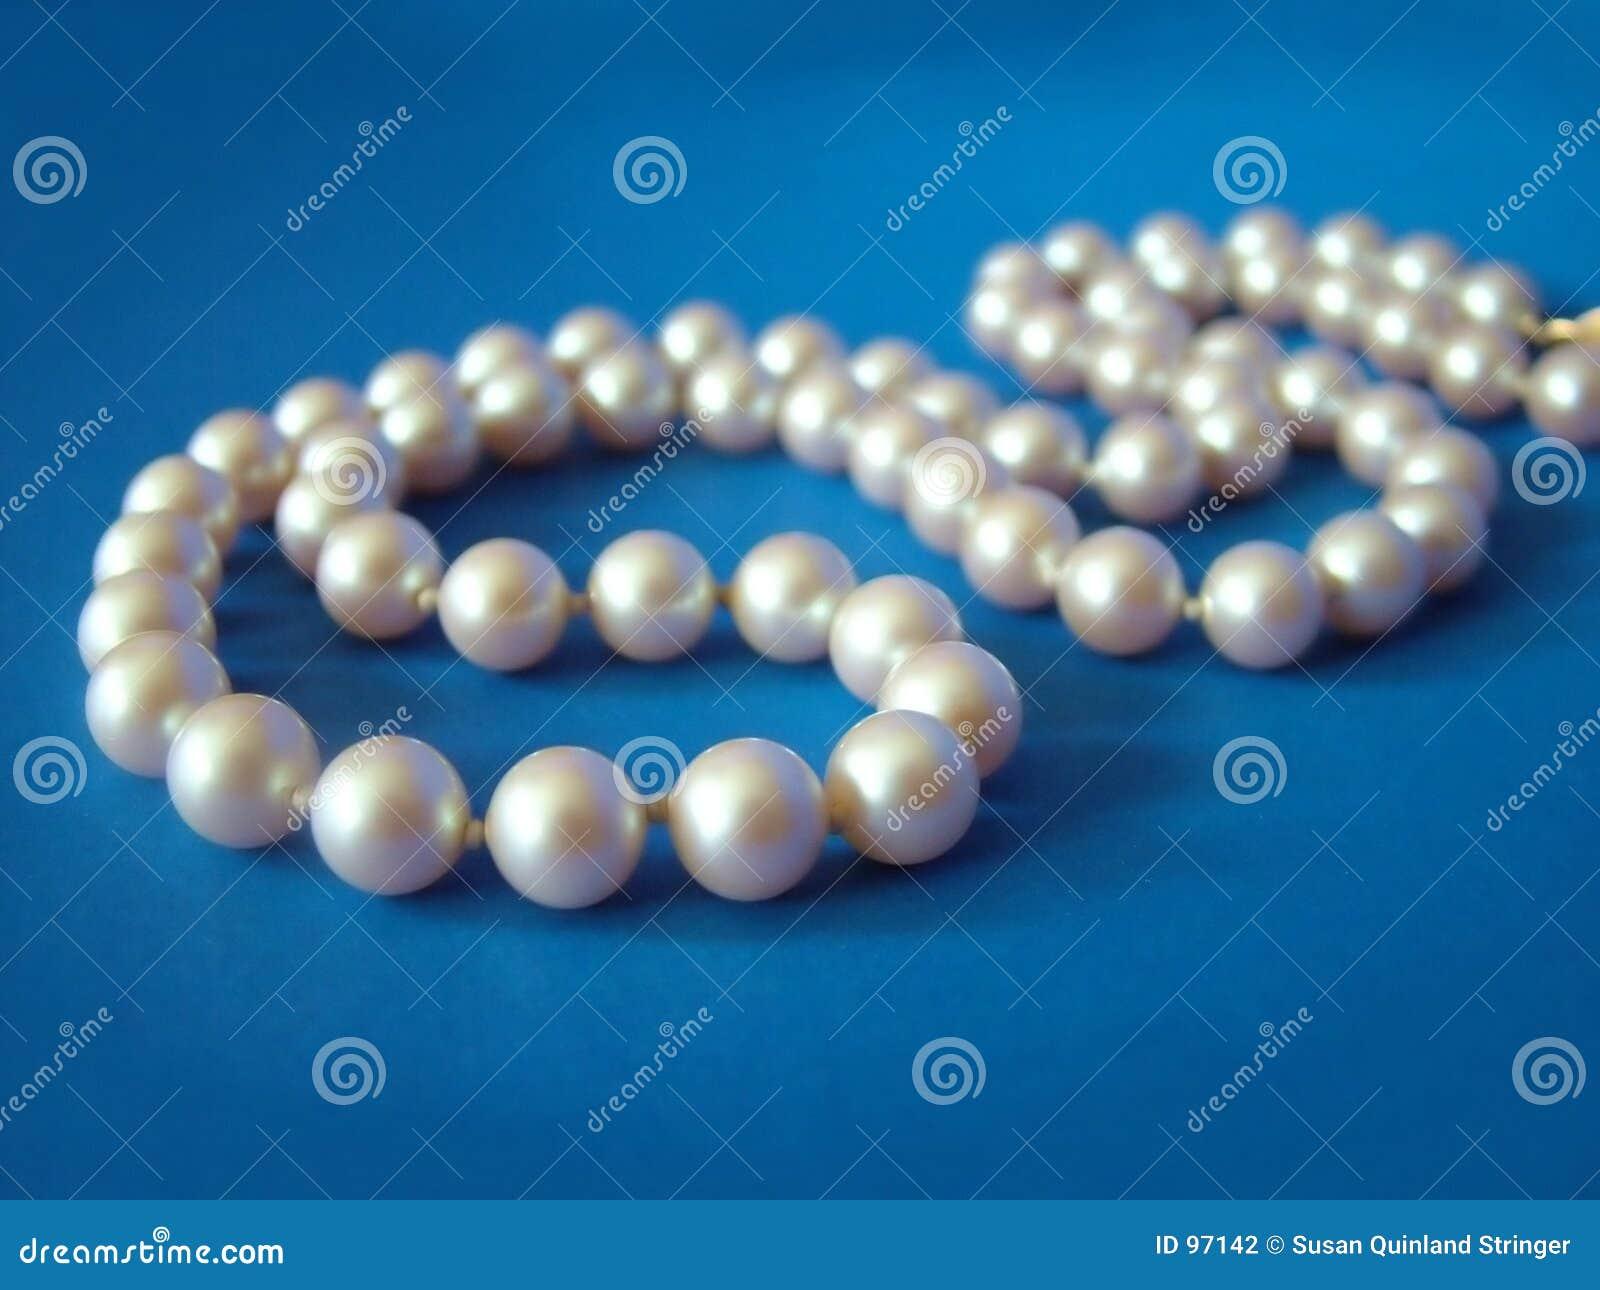 Pearls on Blue